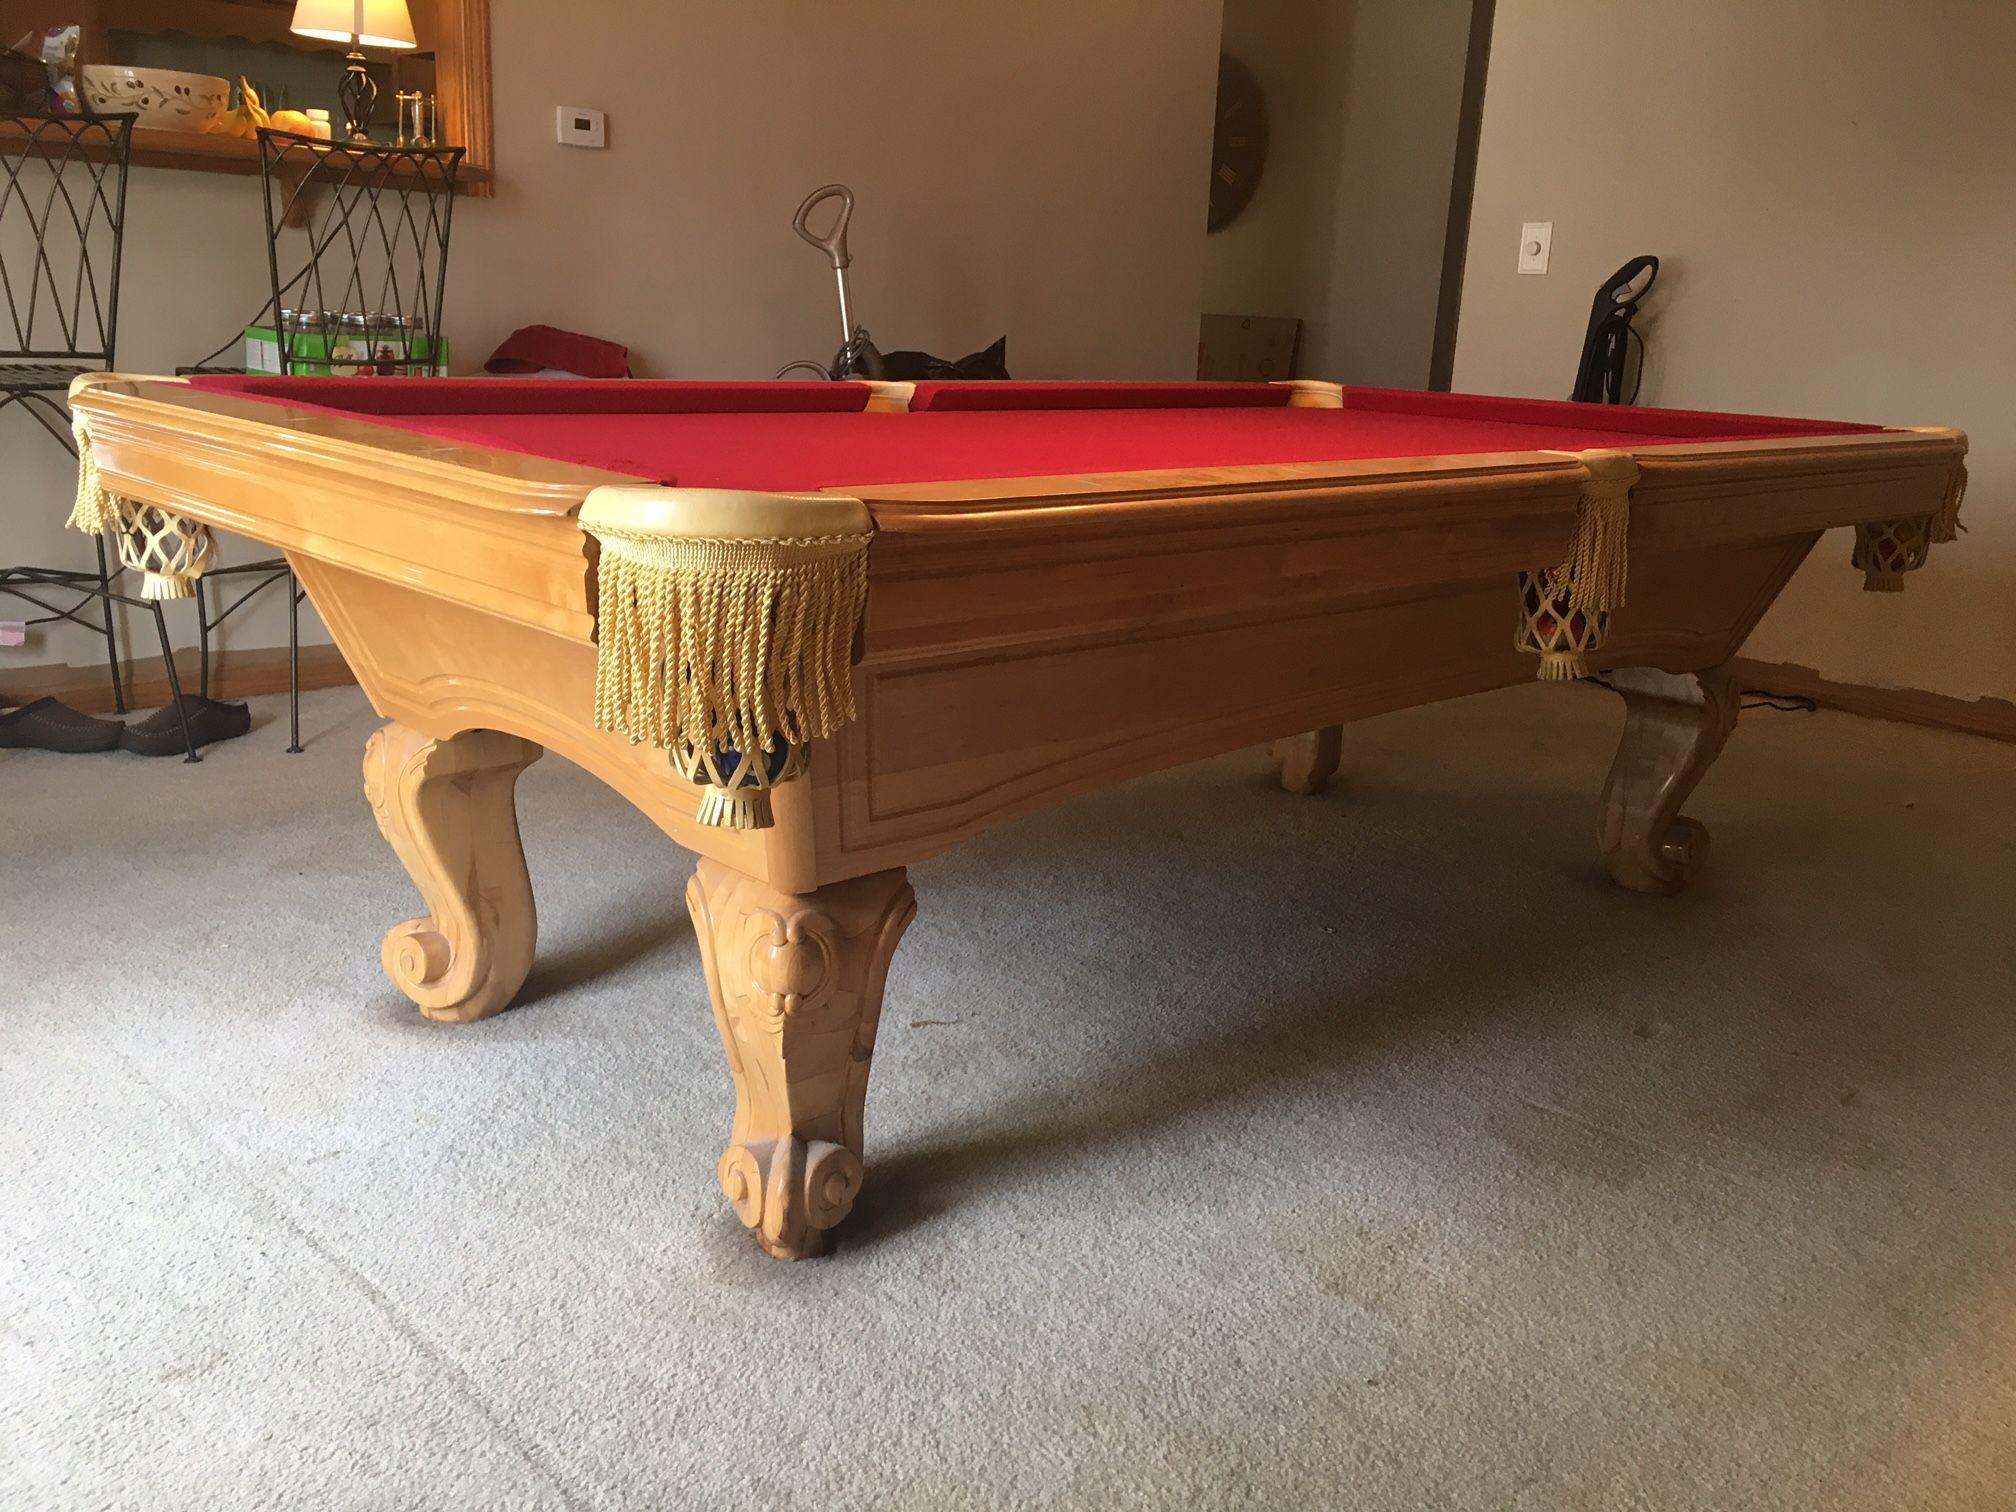 8 dlt billiards sold used pool tables billiard tables over time rh pinterest com